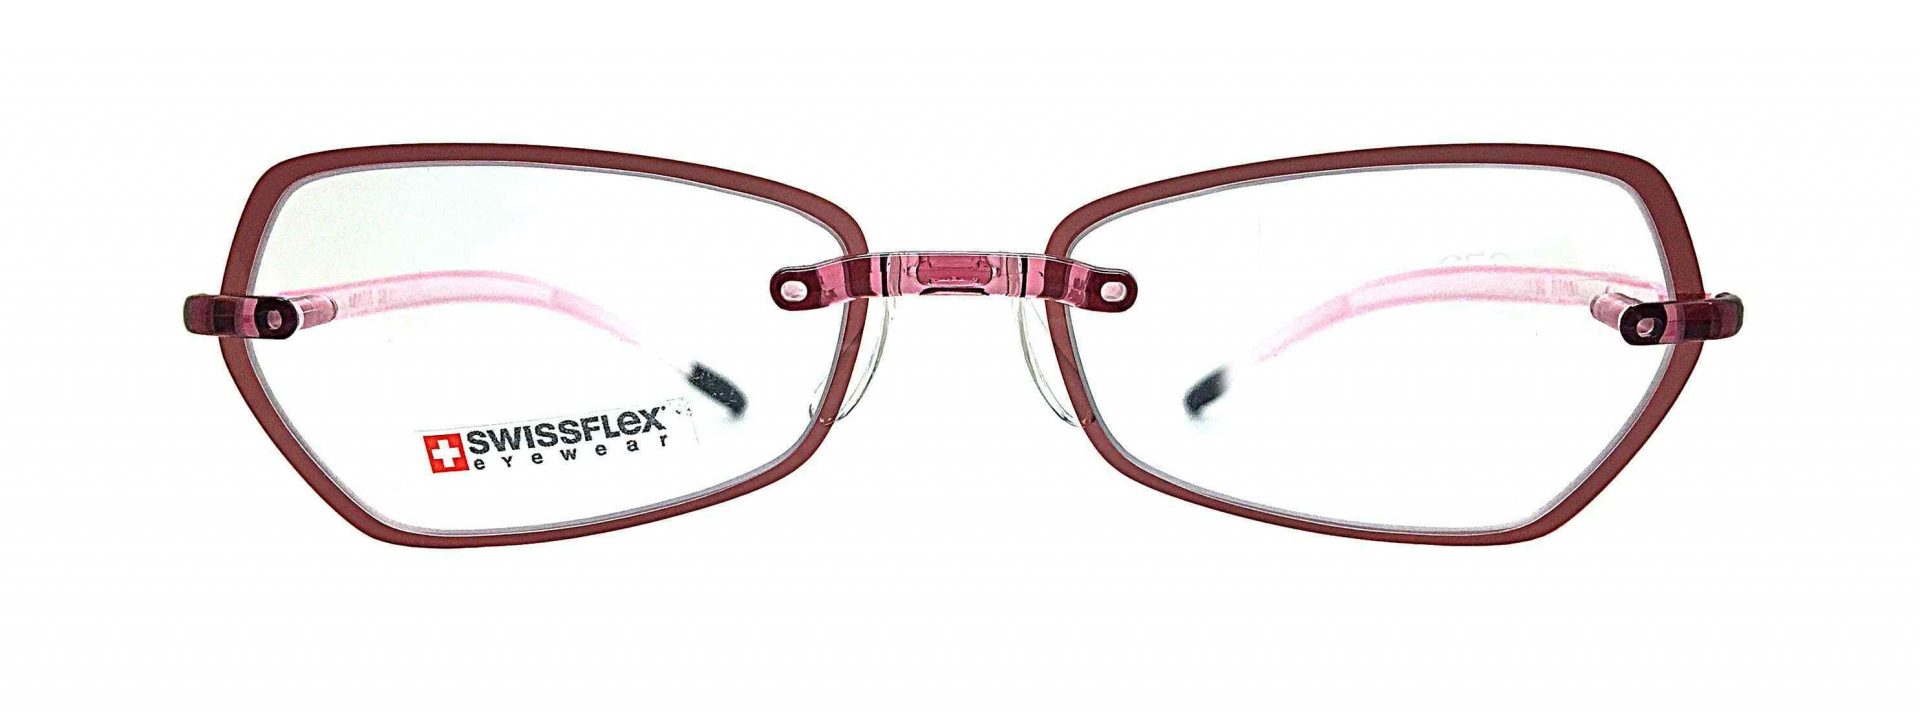 SwissFlex spectacles: SwissFlex Contur 205 52 1 2970x1100